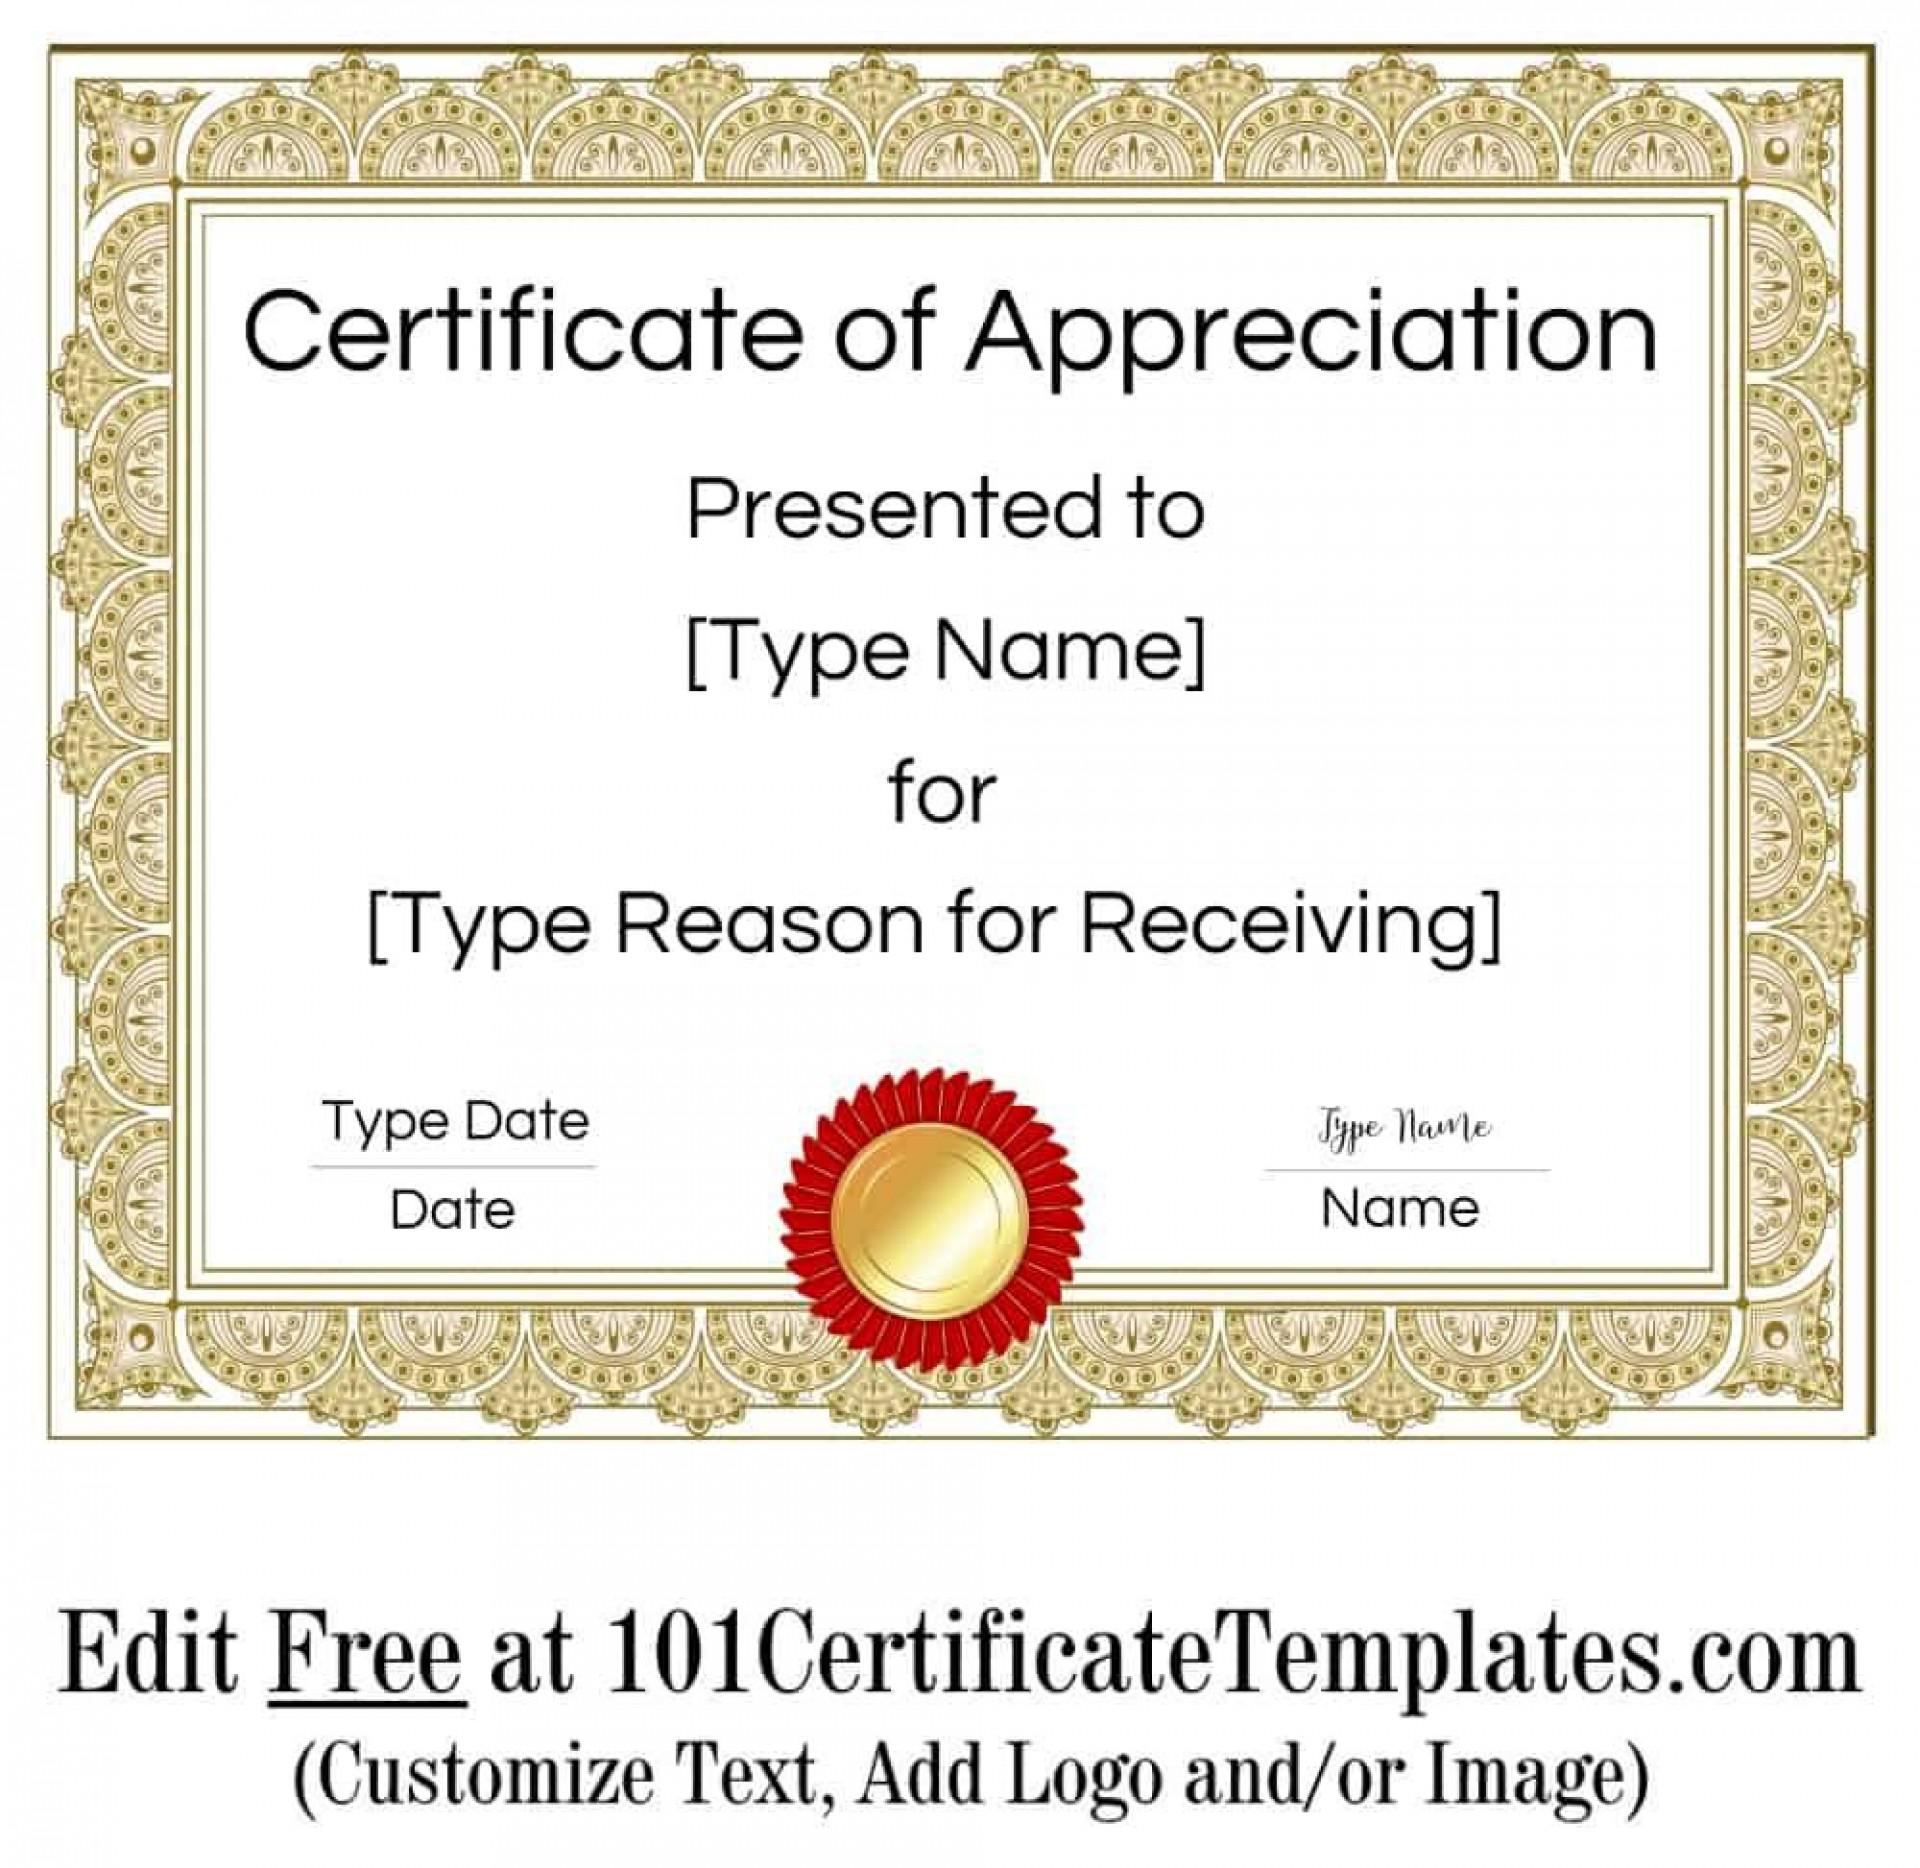 010 Impressive Certificate Of Appreciation Template Free Sample  Microsoft Word Download Publisher Editable1920